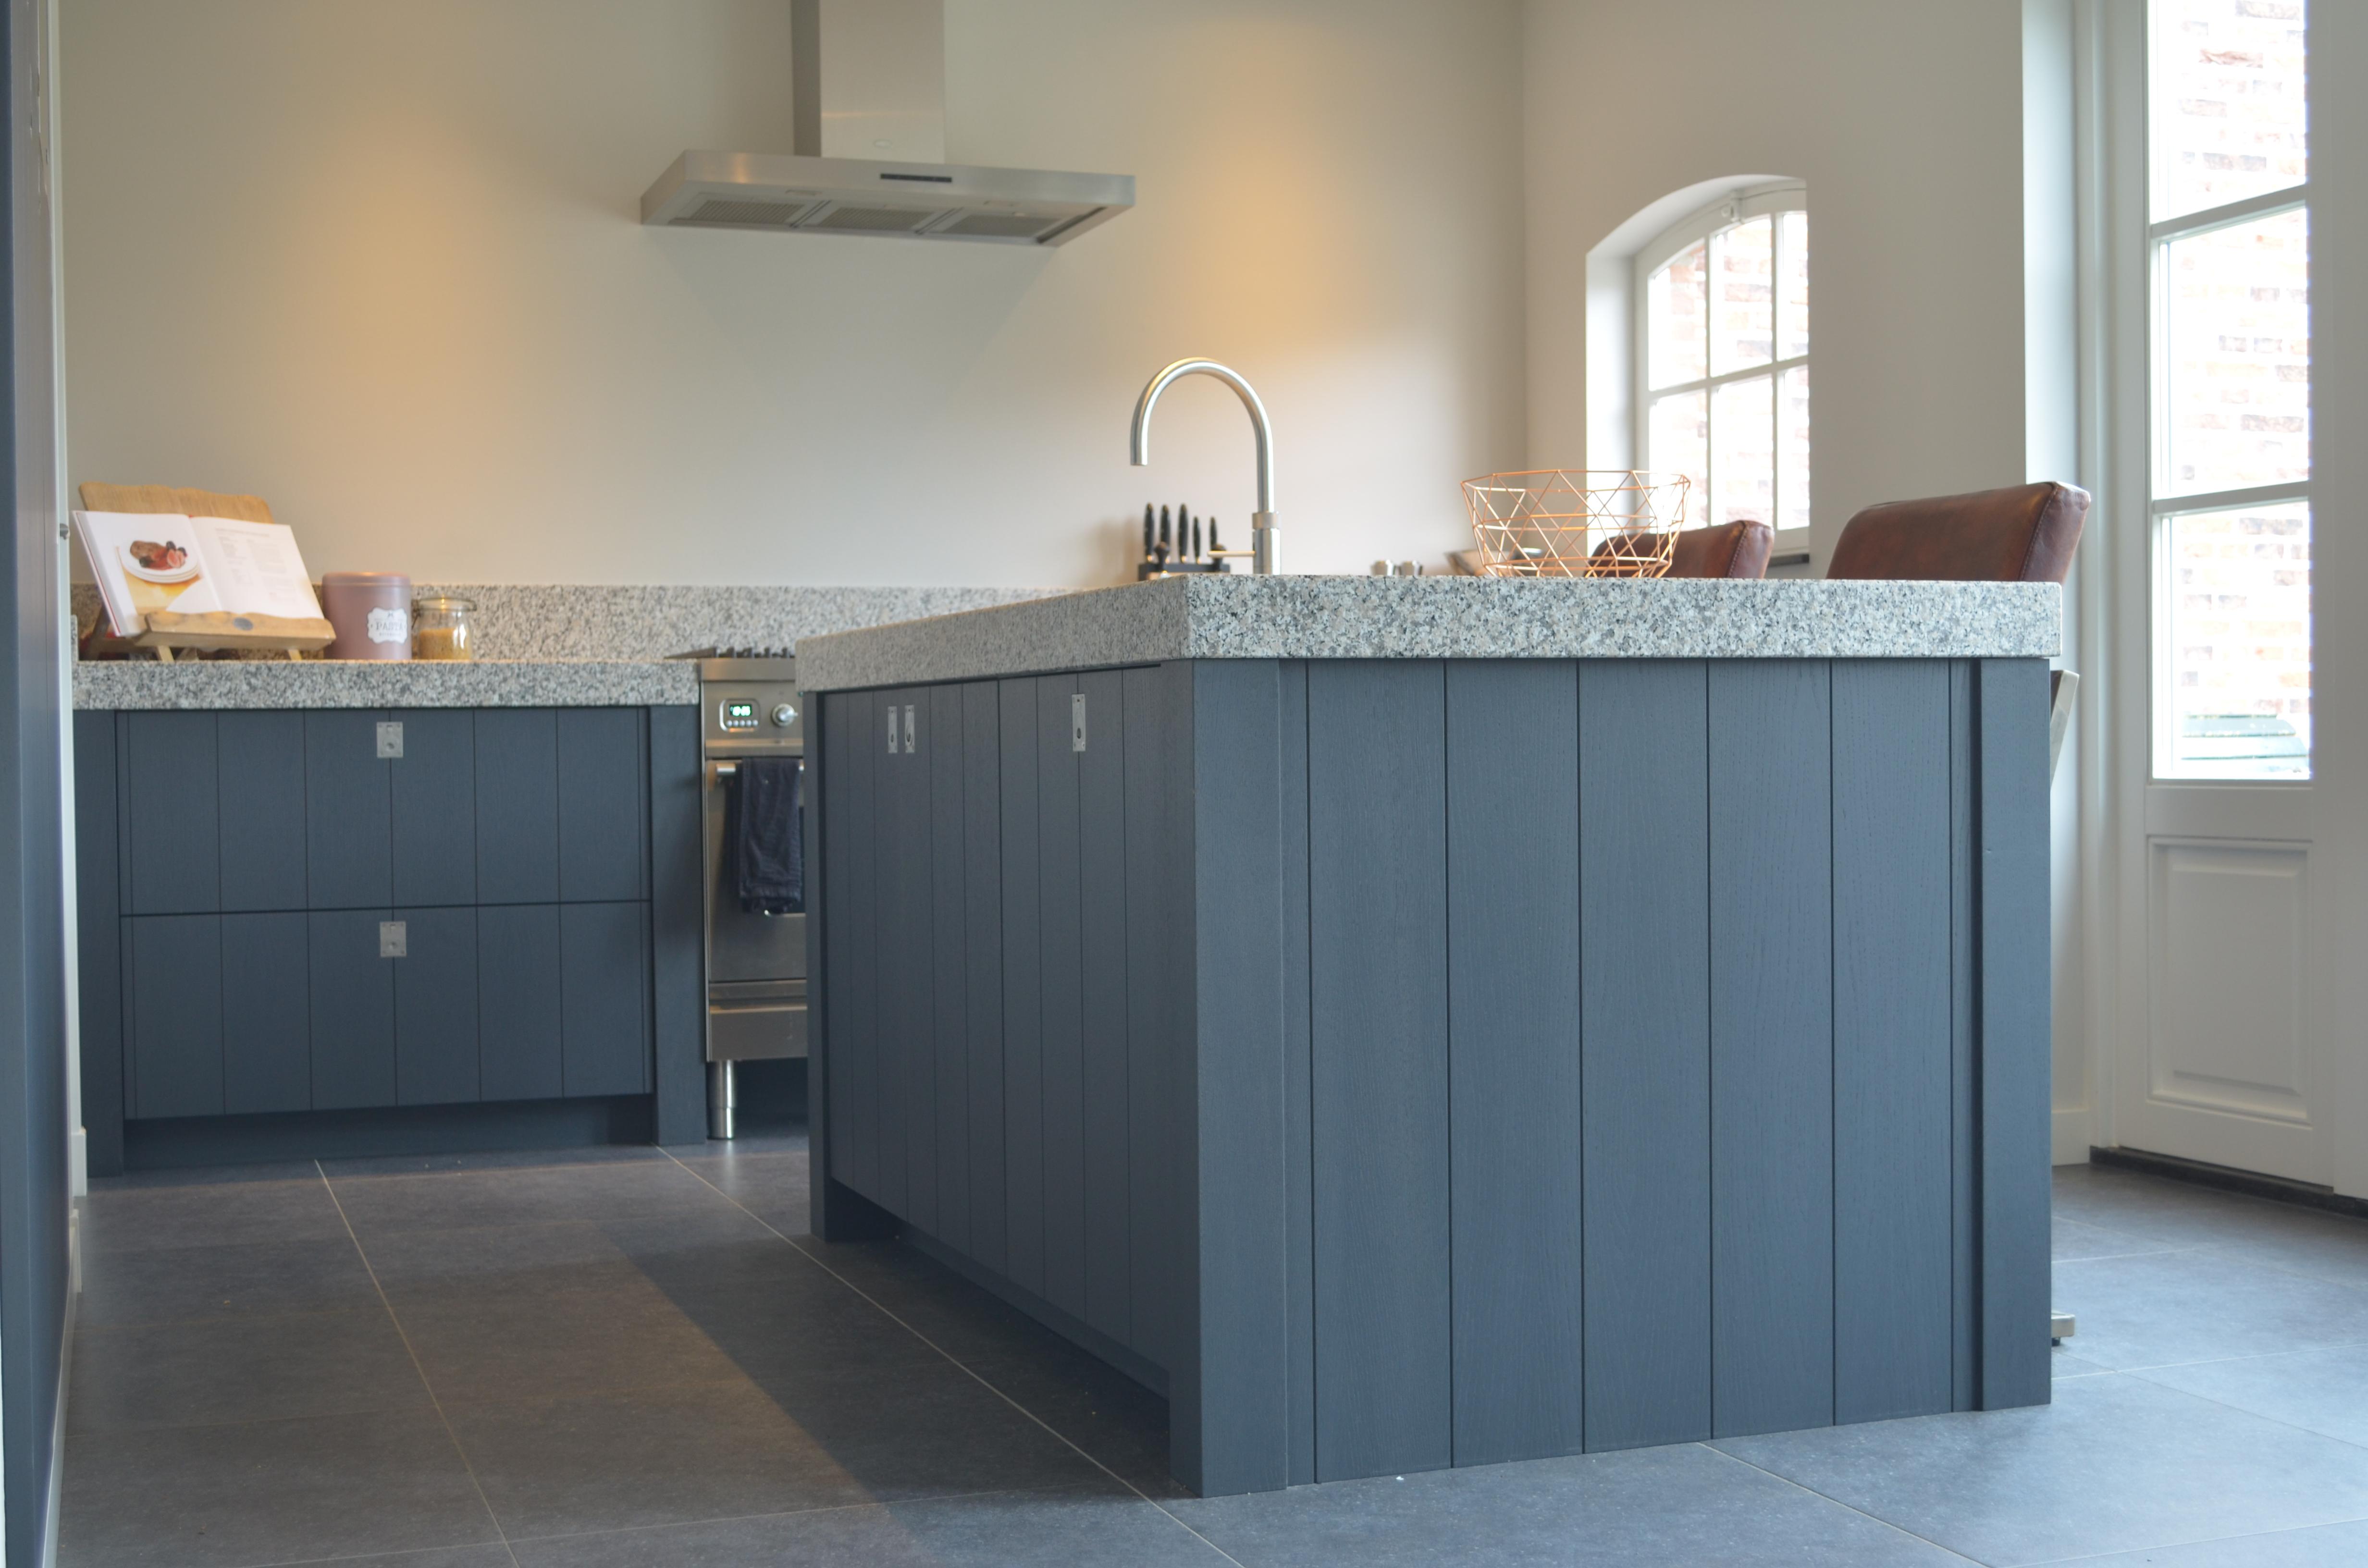 Keuken Landelijk Grijs : Keuken landelijk grijs van Kaathoven Interieurbouw